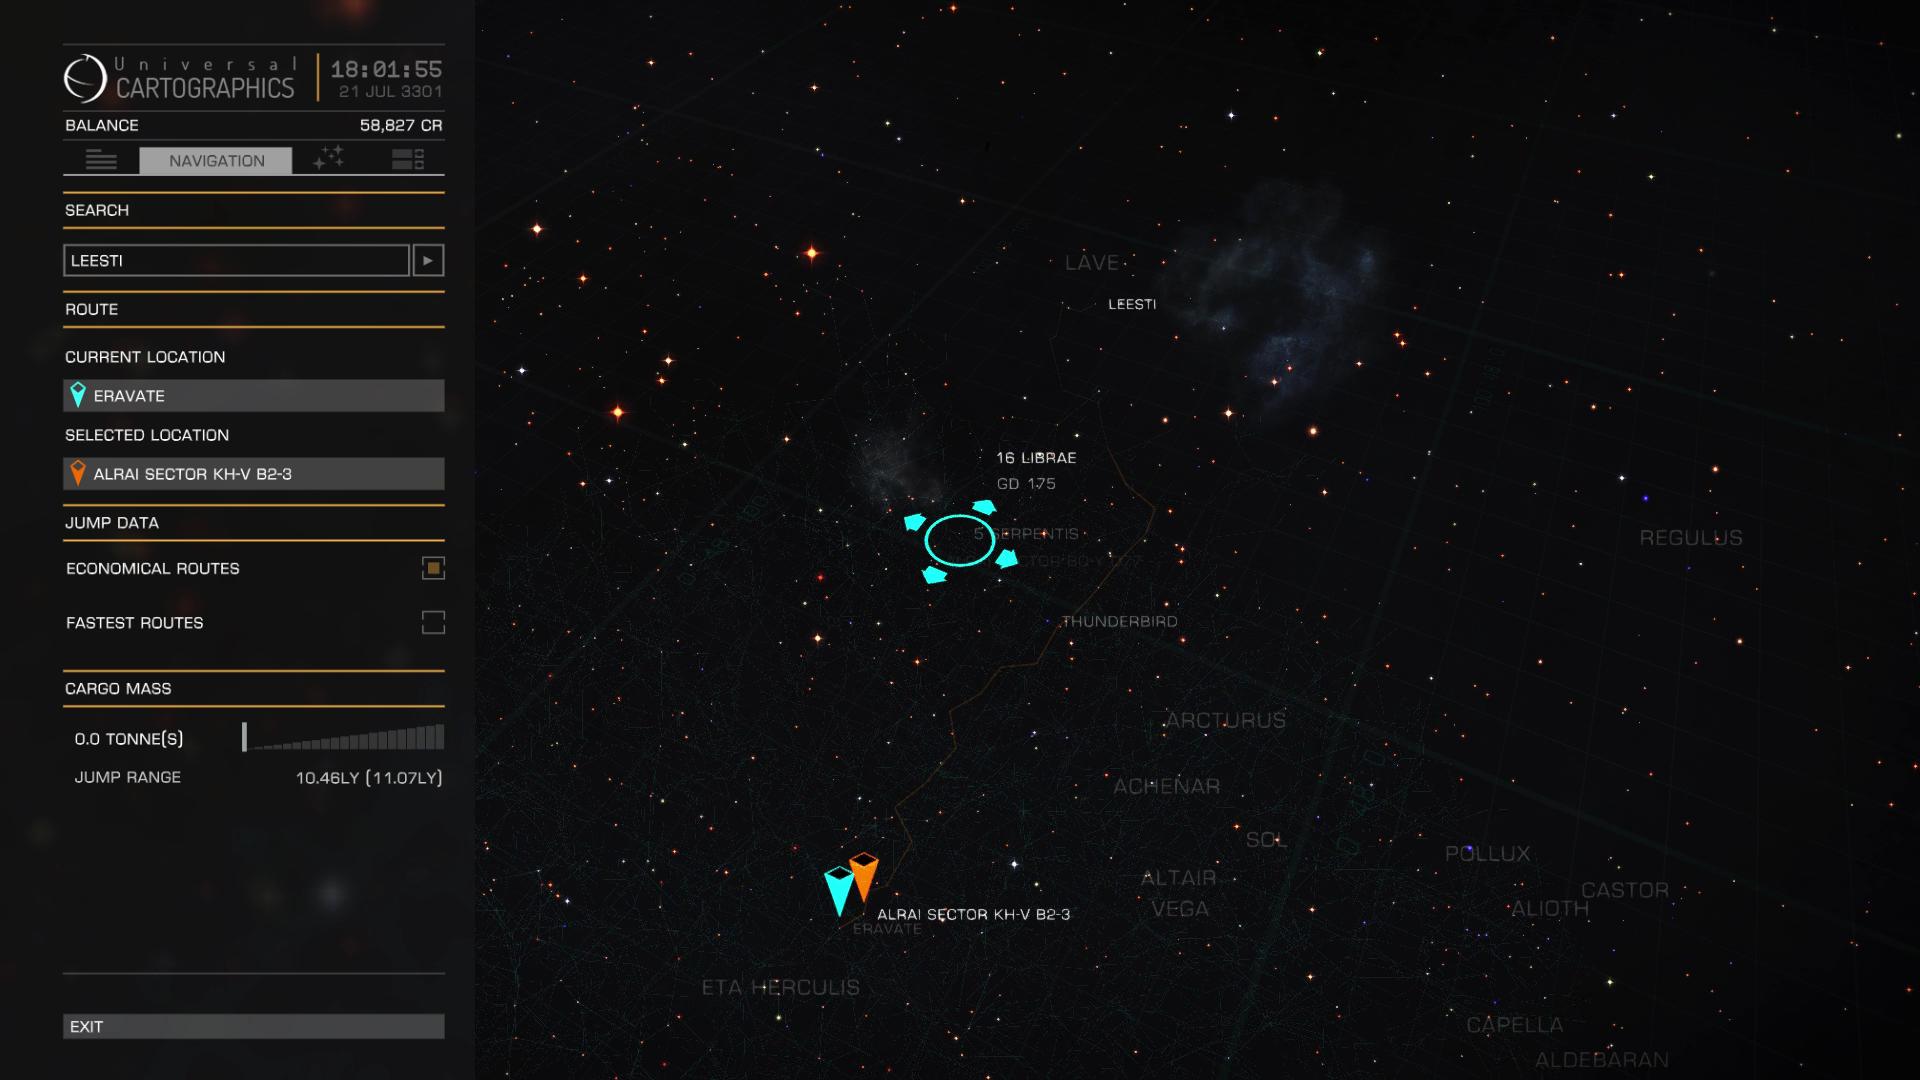 Elite Dangerous Screenshot 2015-07-21 19-02-02